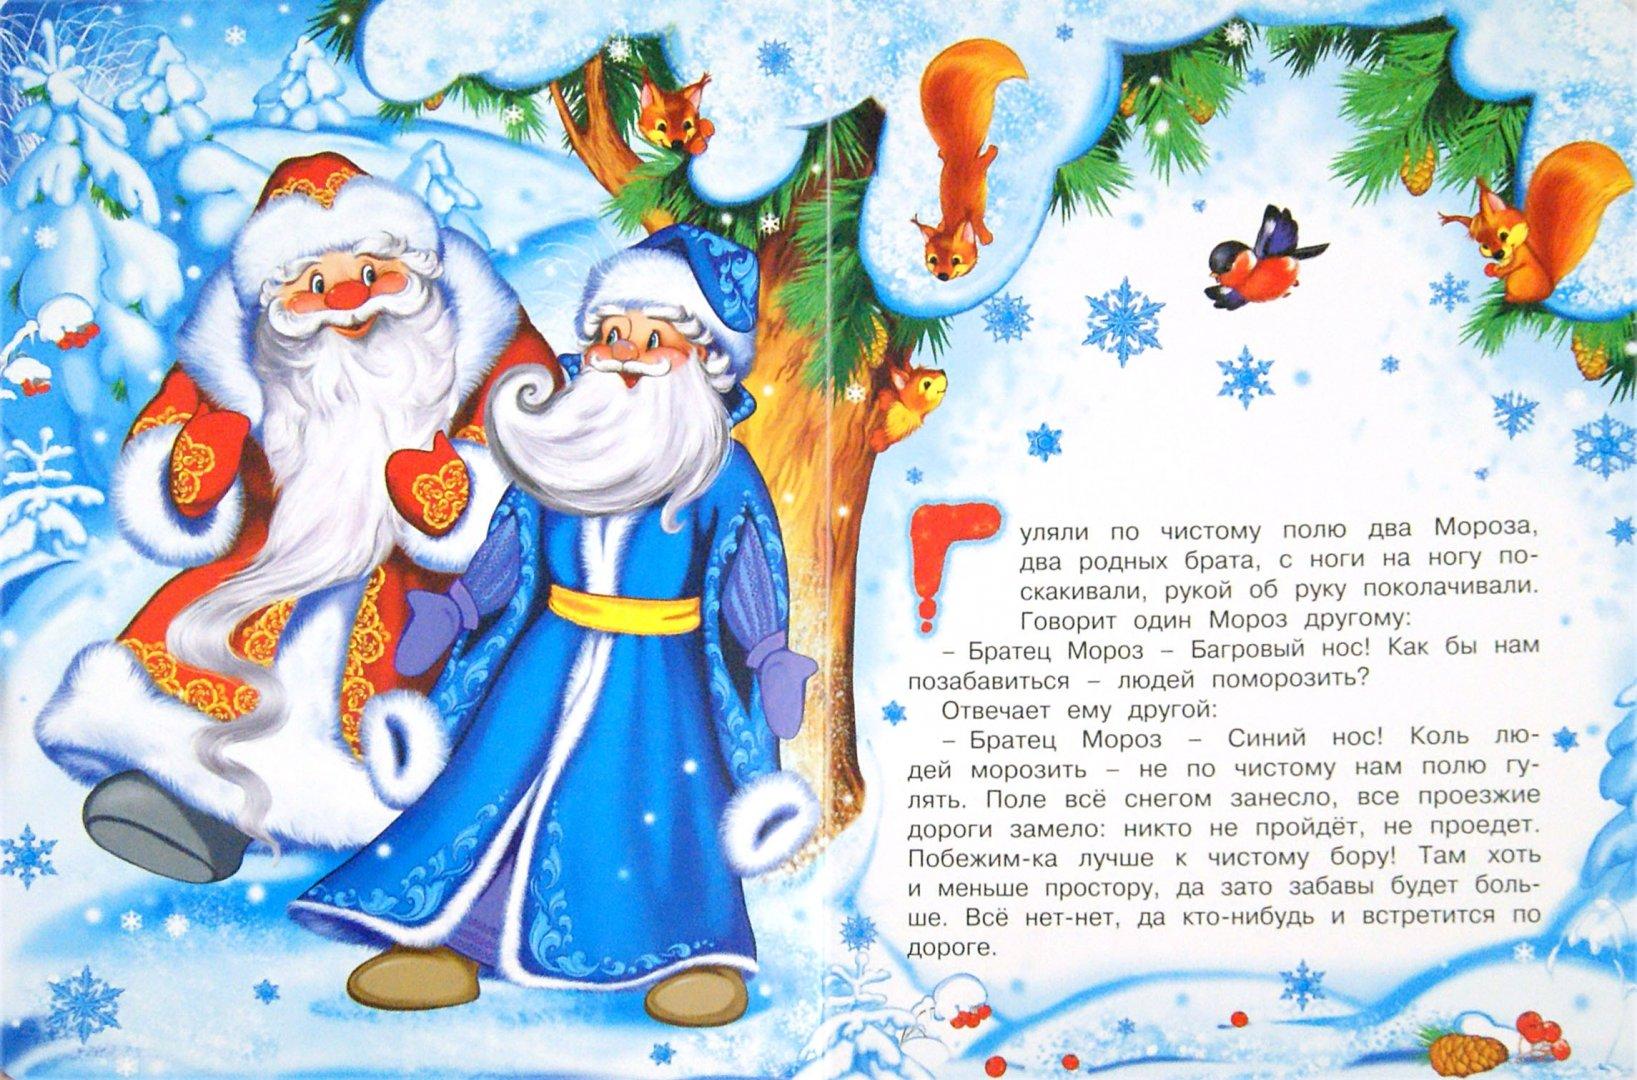 Русская сказка два мороза картинках